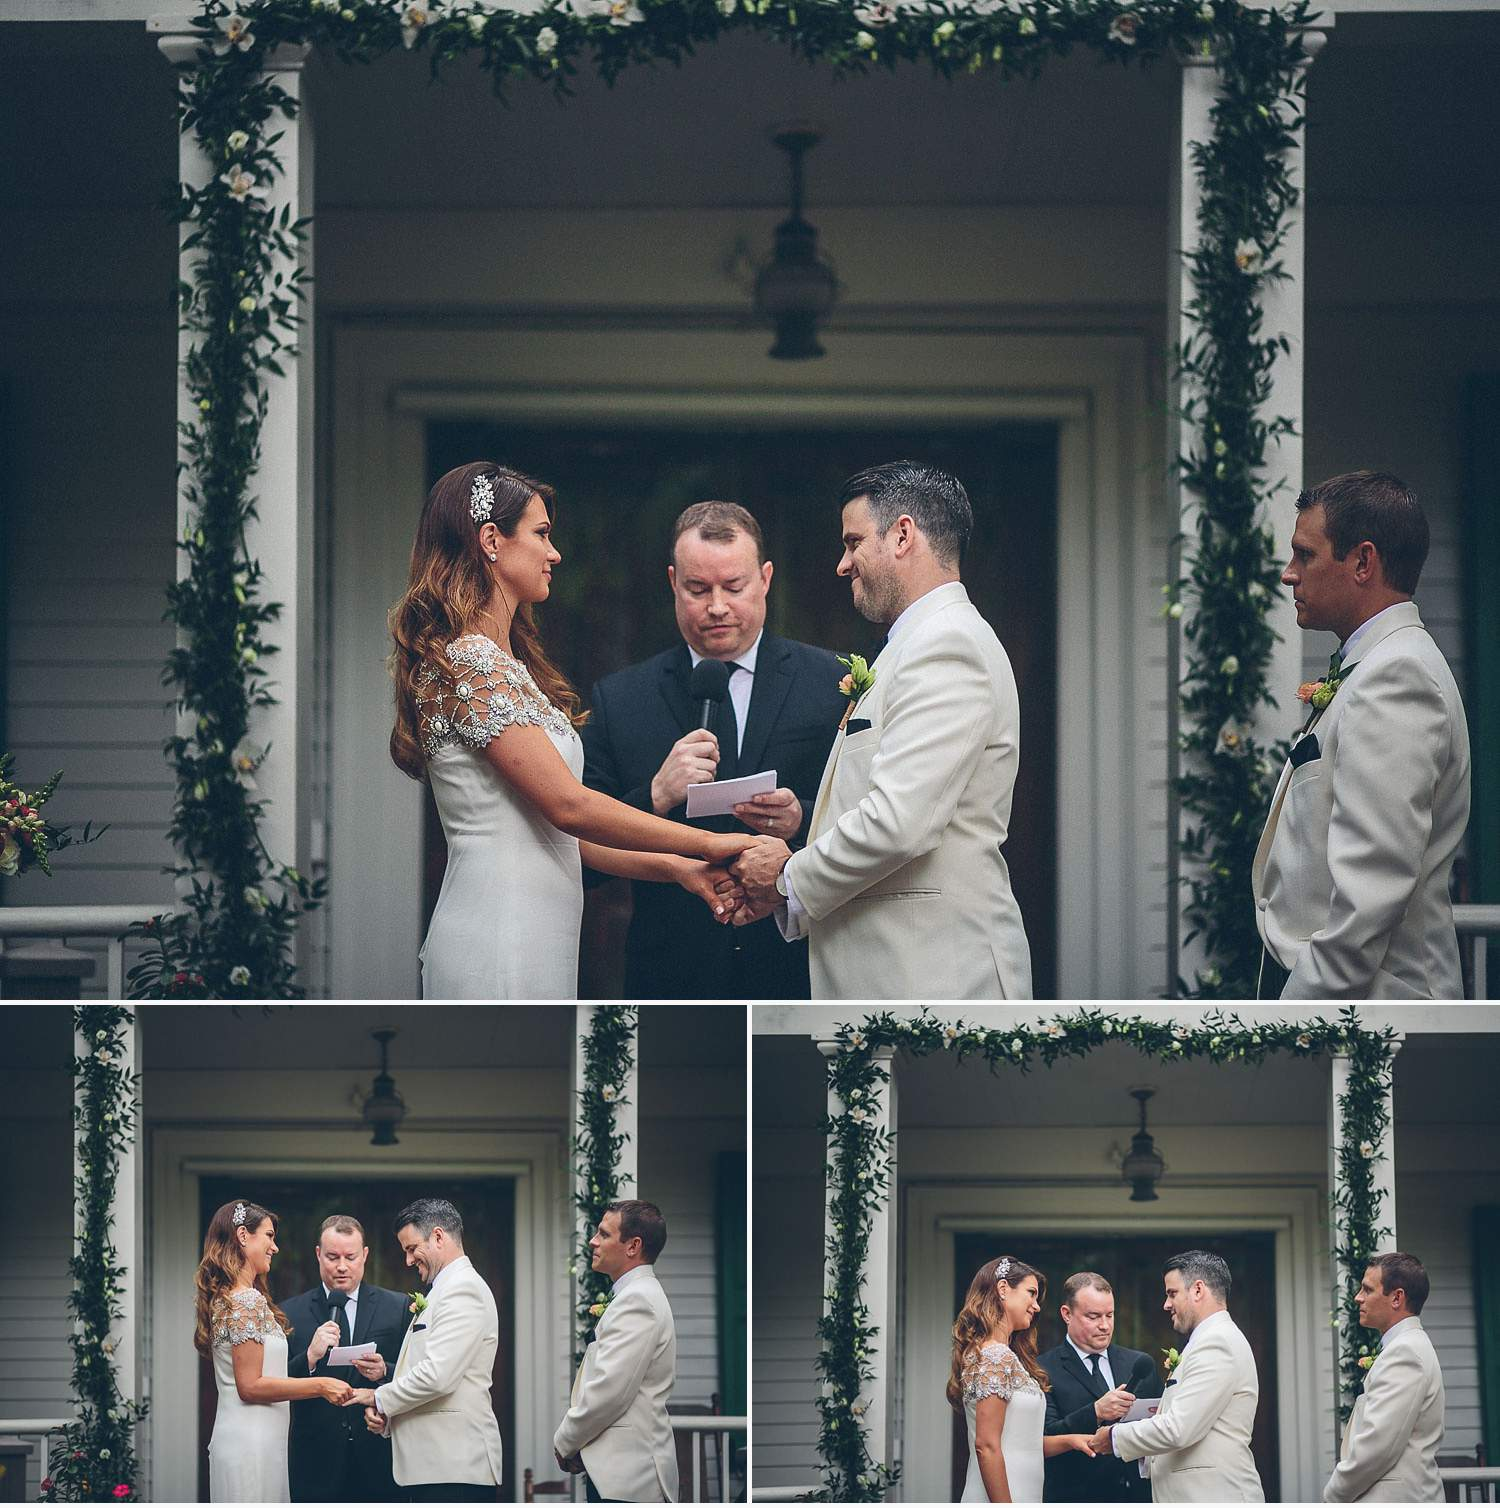 audubon-house-key-west-wedding-photographer-daniel-lateulade-0020.JPG